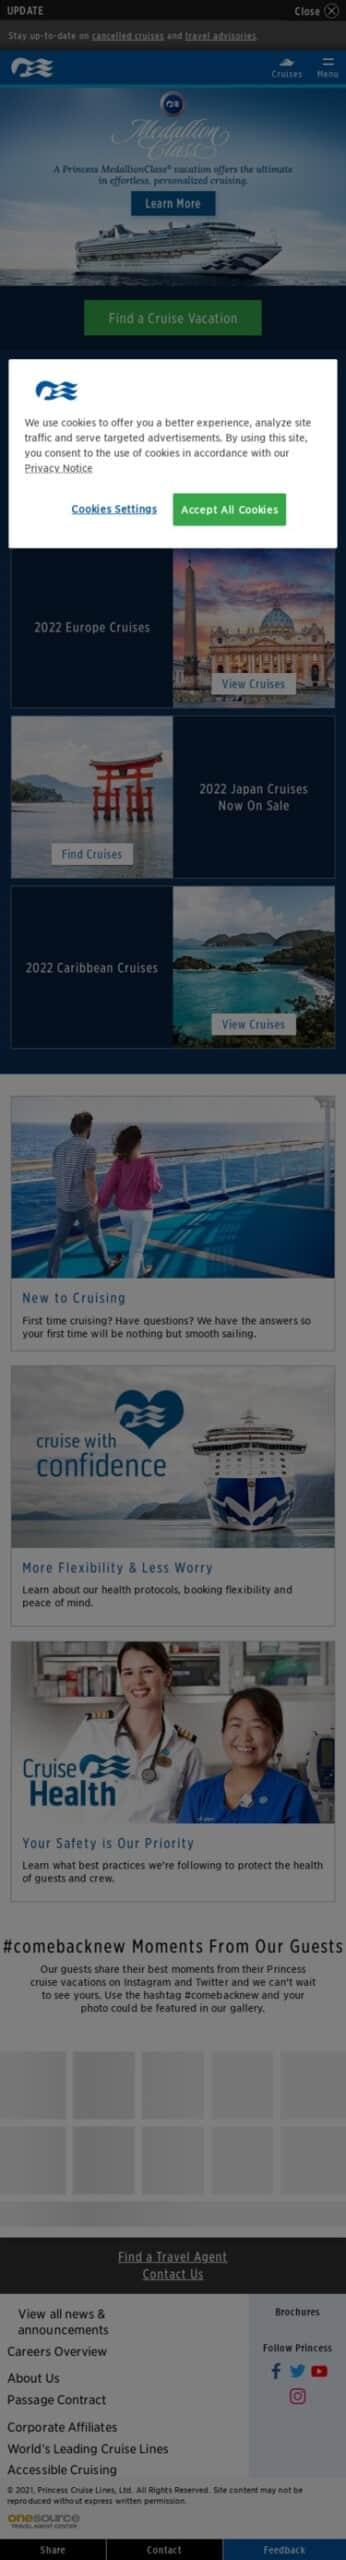 Princess Cruise Lines, Coupon